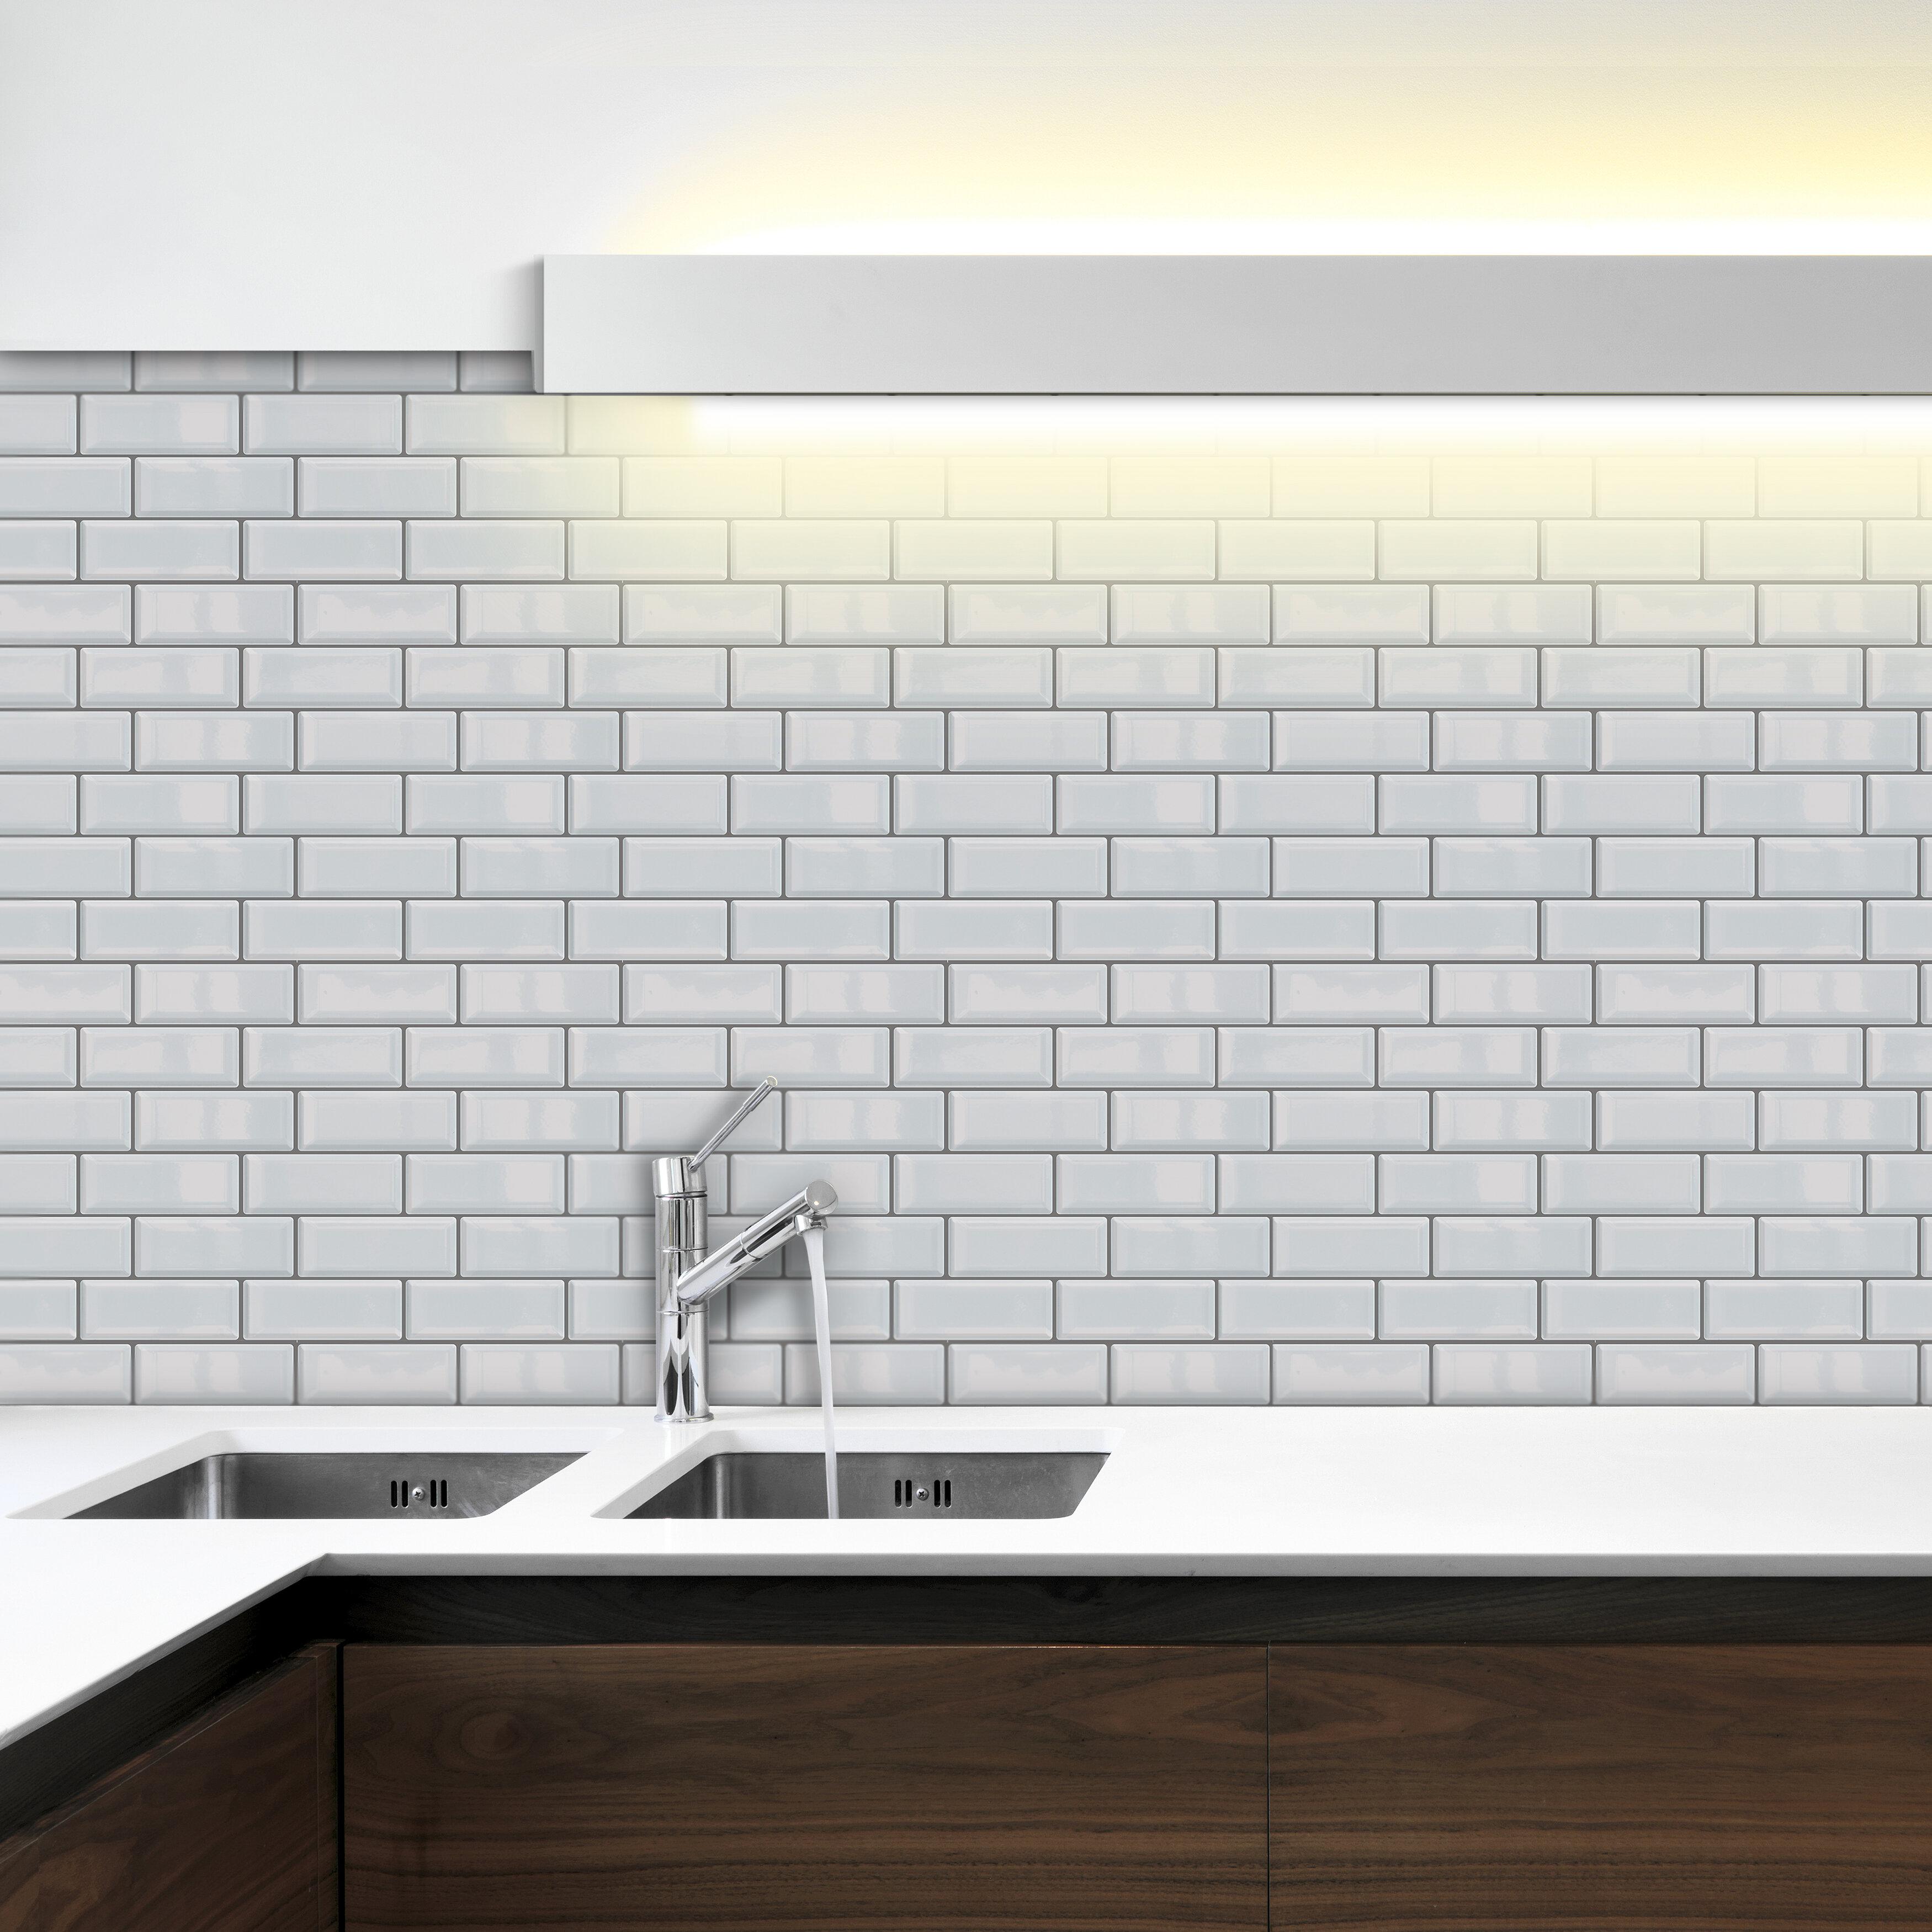 12 3d Mosaic Self Adhesive Bathroom Kitchen Wall Brick Printed Tile Stickers Uk Wallpaper Rolls Sheets Home Furniture Diy Plastpath Com Br